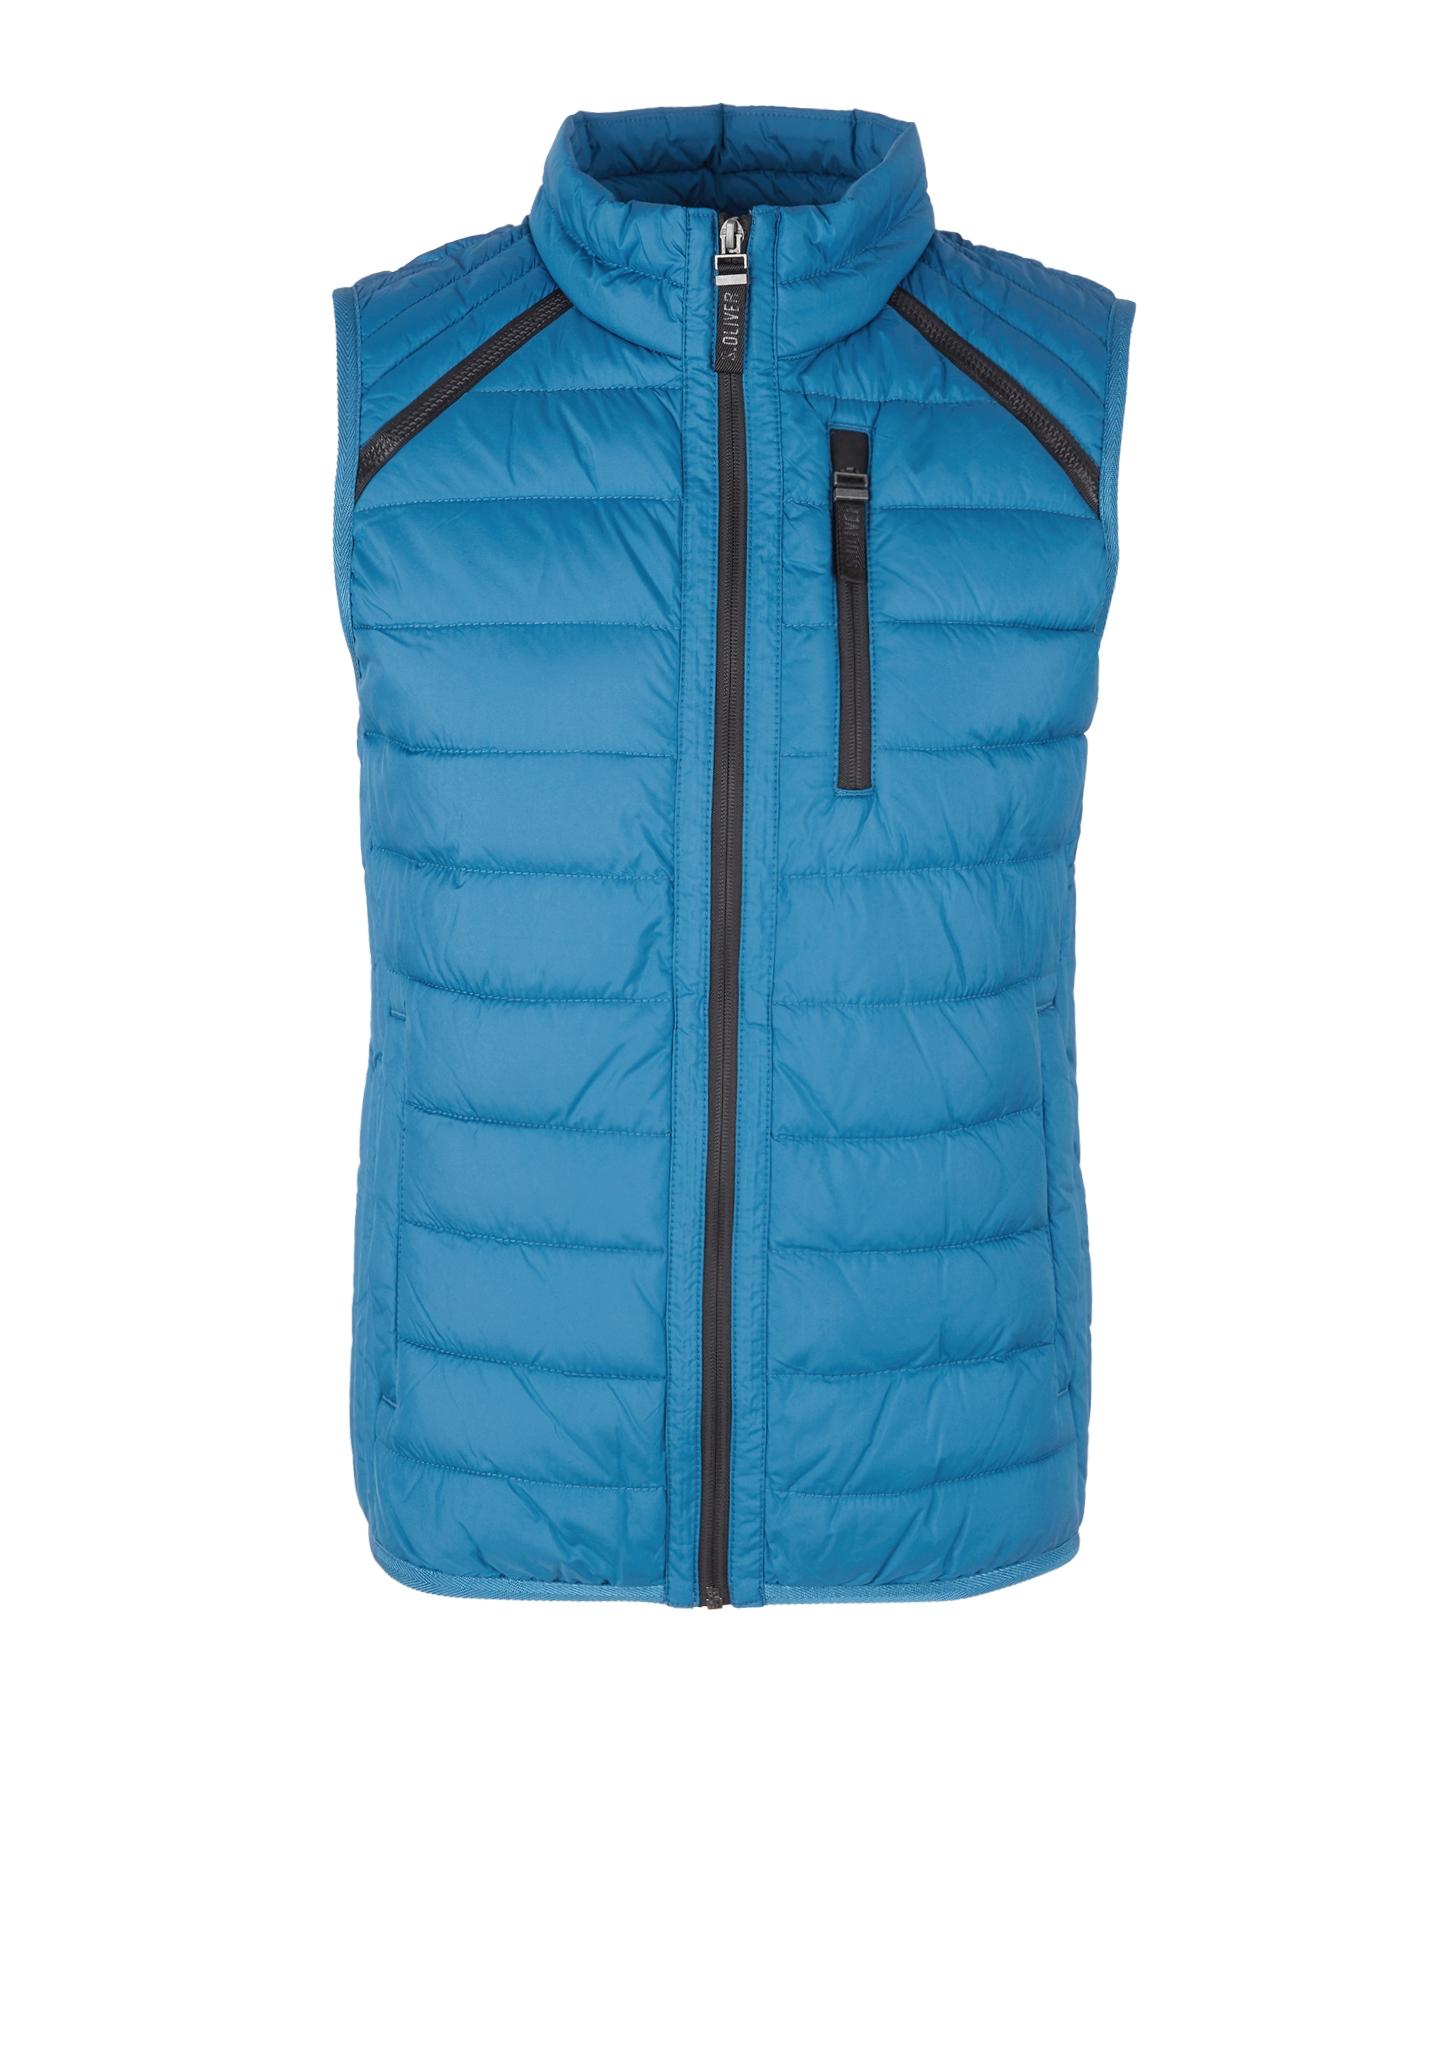 Steppweste | Bekleidung > Westen > Steppwesten | Blau | Obermaterial 100% polyester| futter 100% polyamid| füllmaterial 100% polyester | s.Oliver